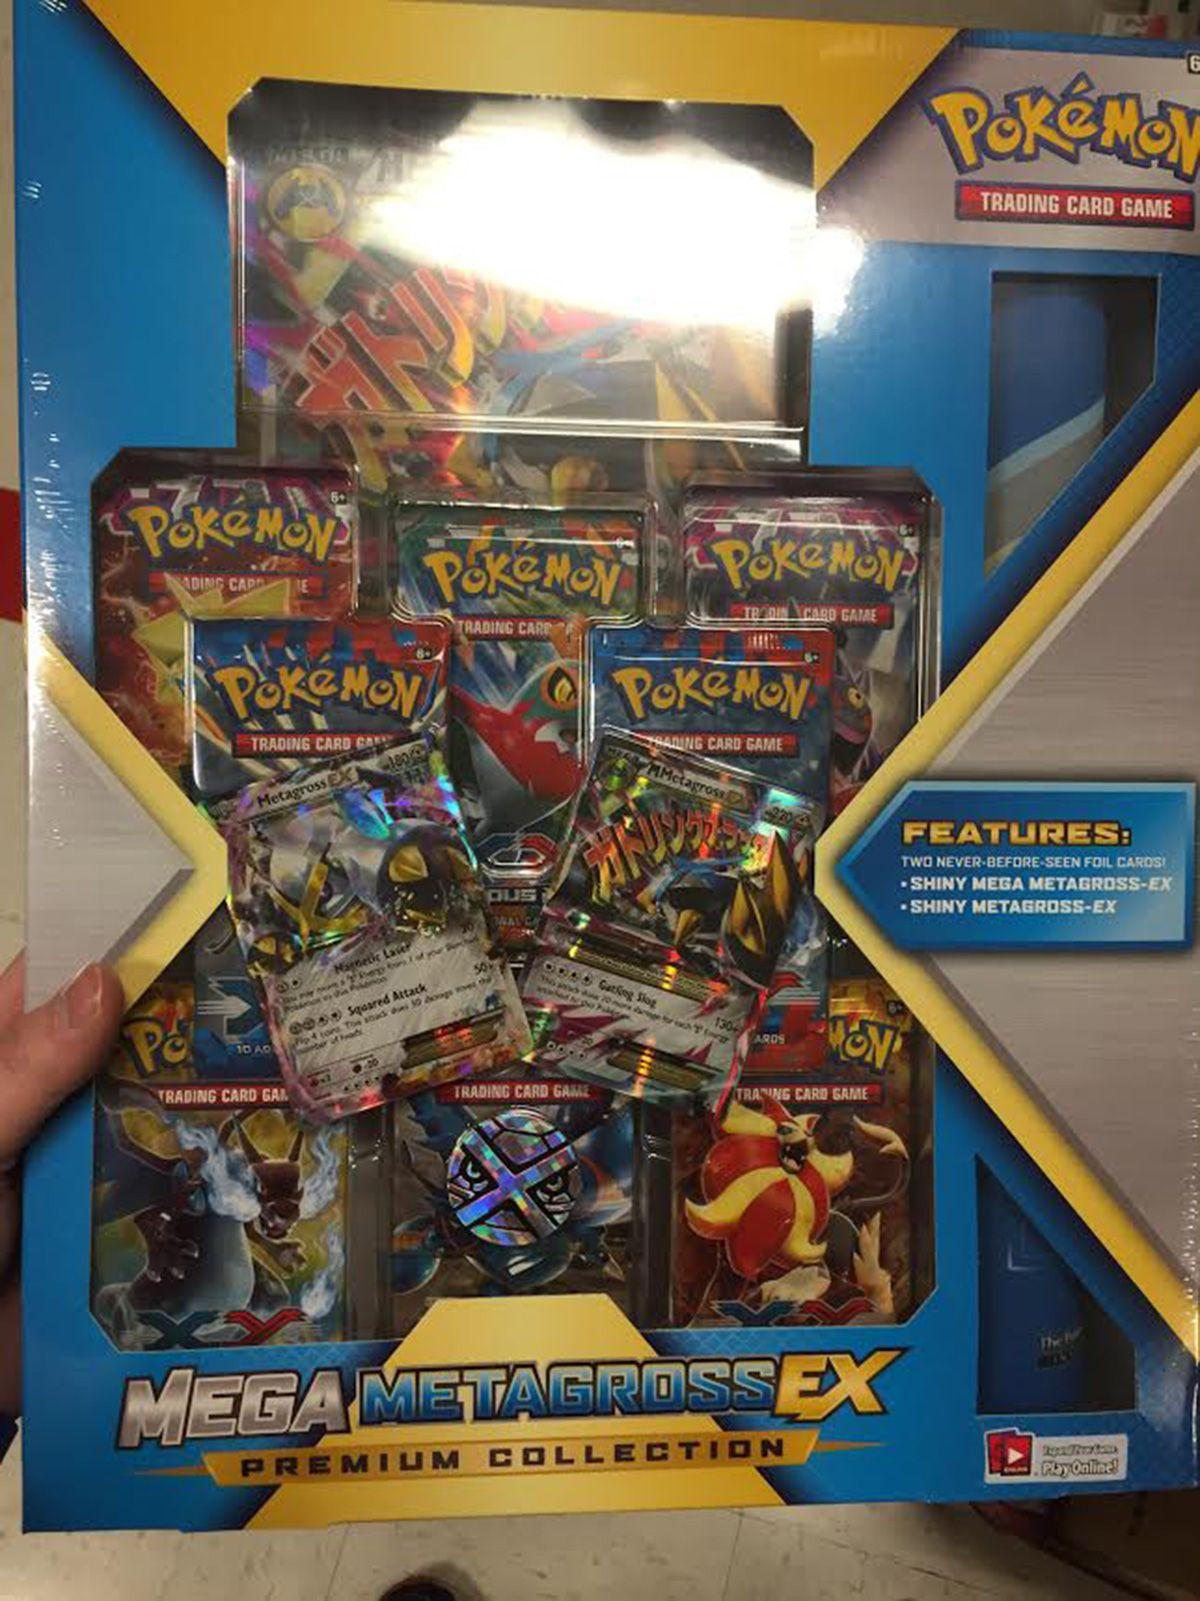 Mega metagrossex premium collection pokemon pokemon